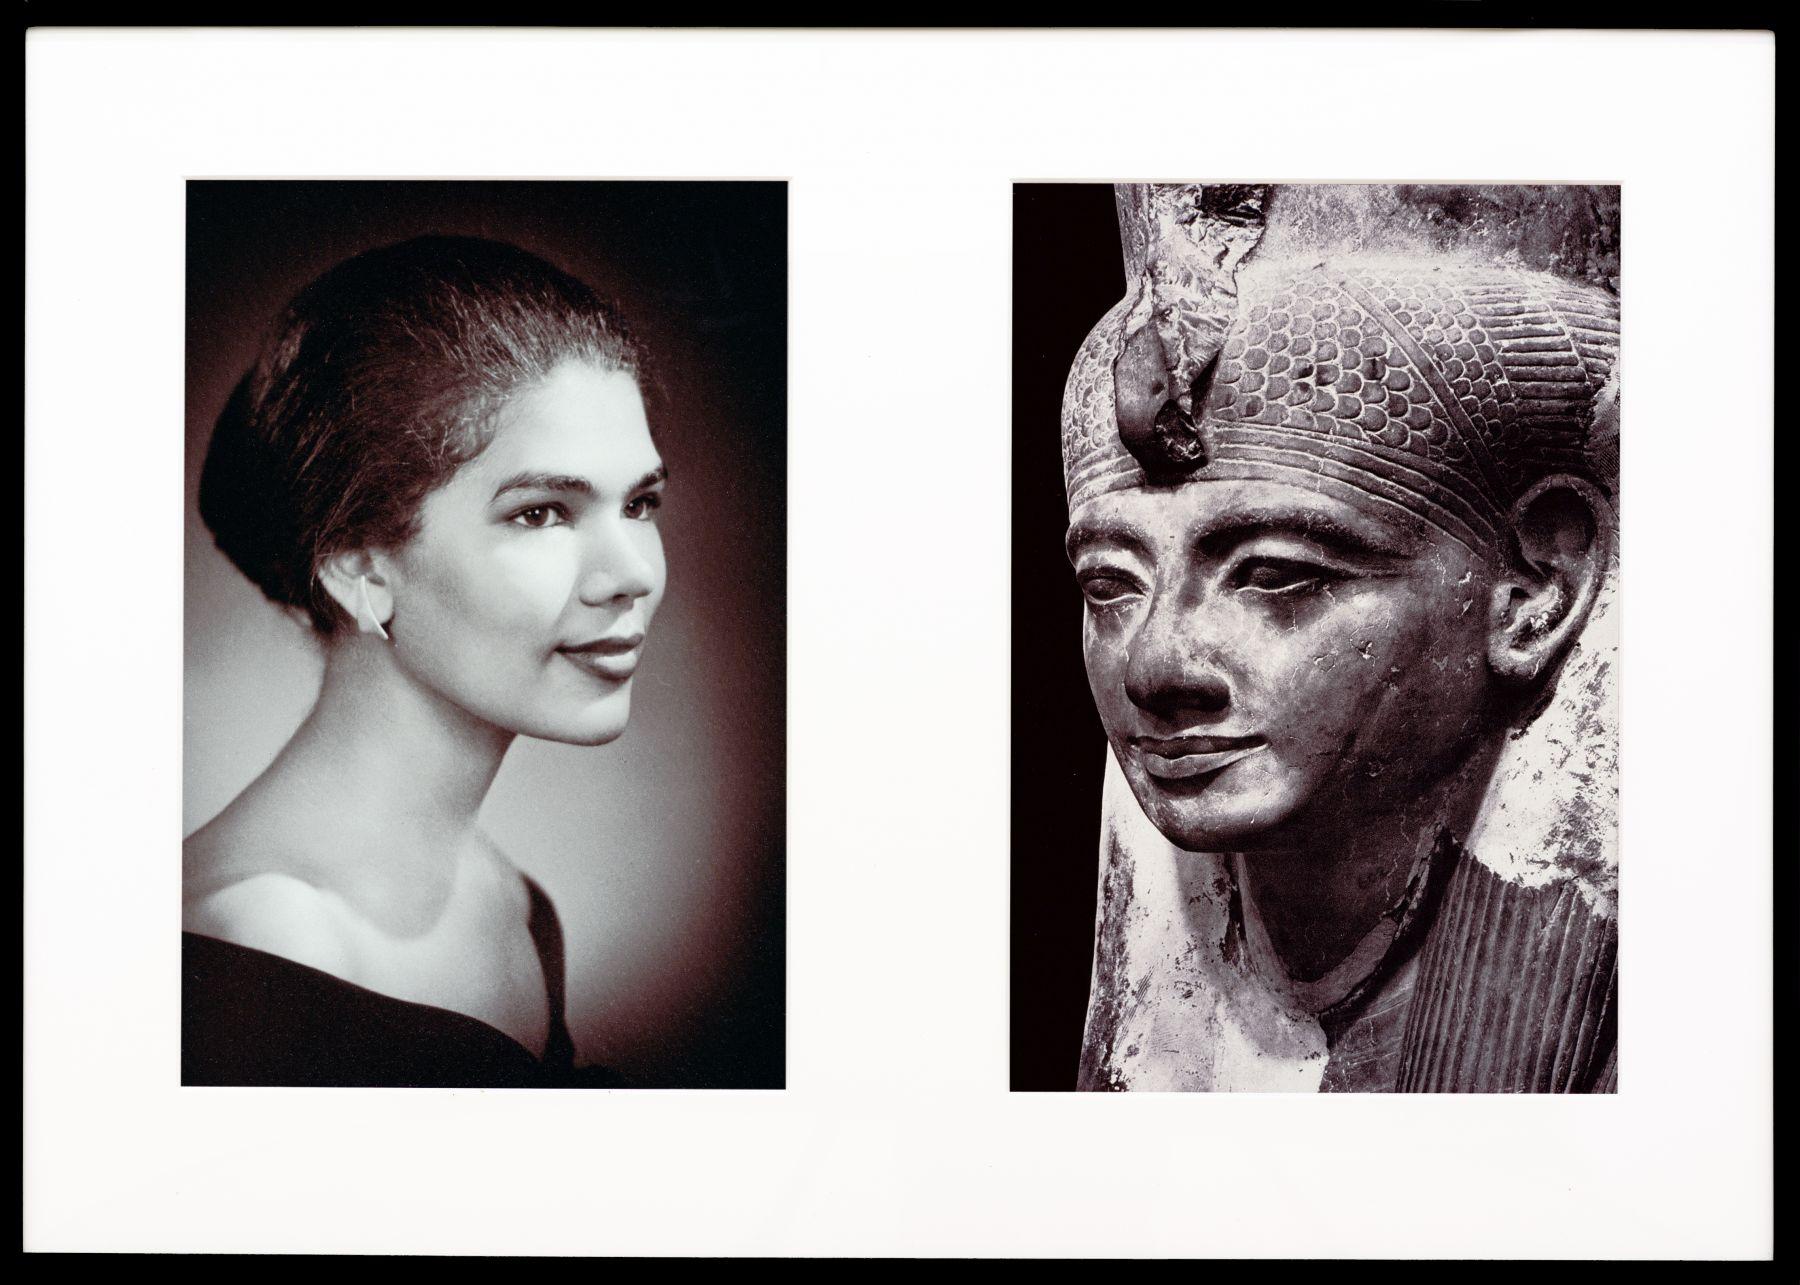 Miscegenated Family Album (Sisters IV), L: Devonia's sister, Lorraine; R: Nefertiti's sister, Mutnedjmet, 1980/1994, Cibachrome print, 26h x 37w in (66.04h x 93.98w cm)